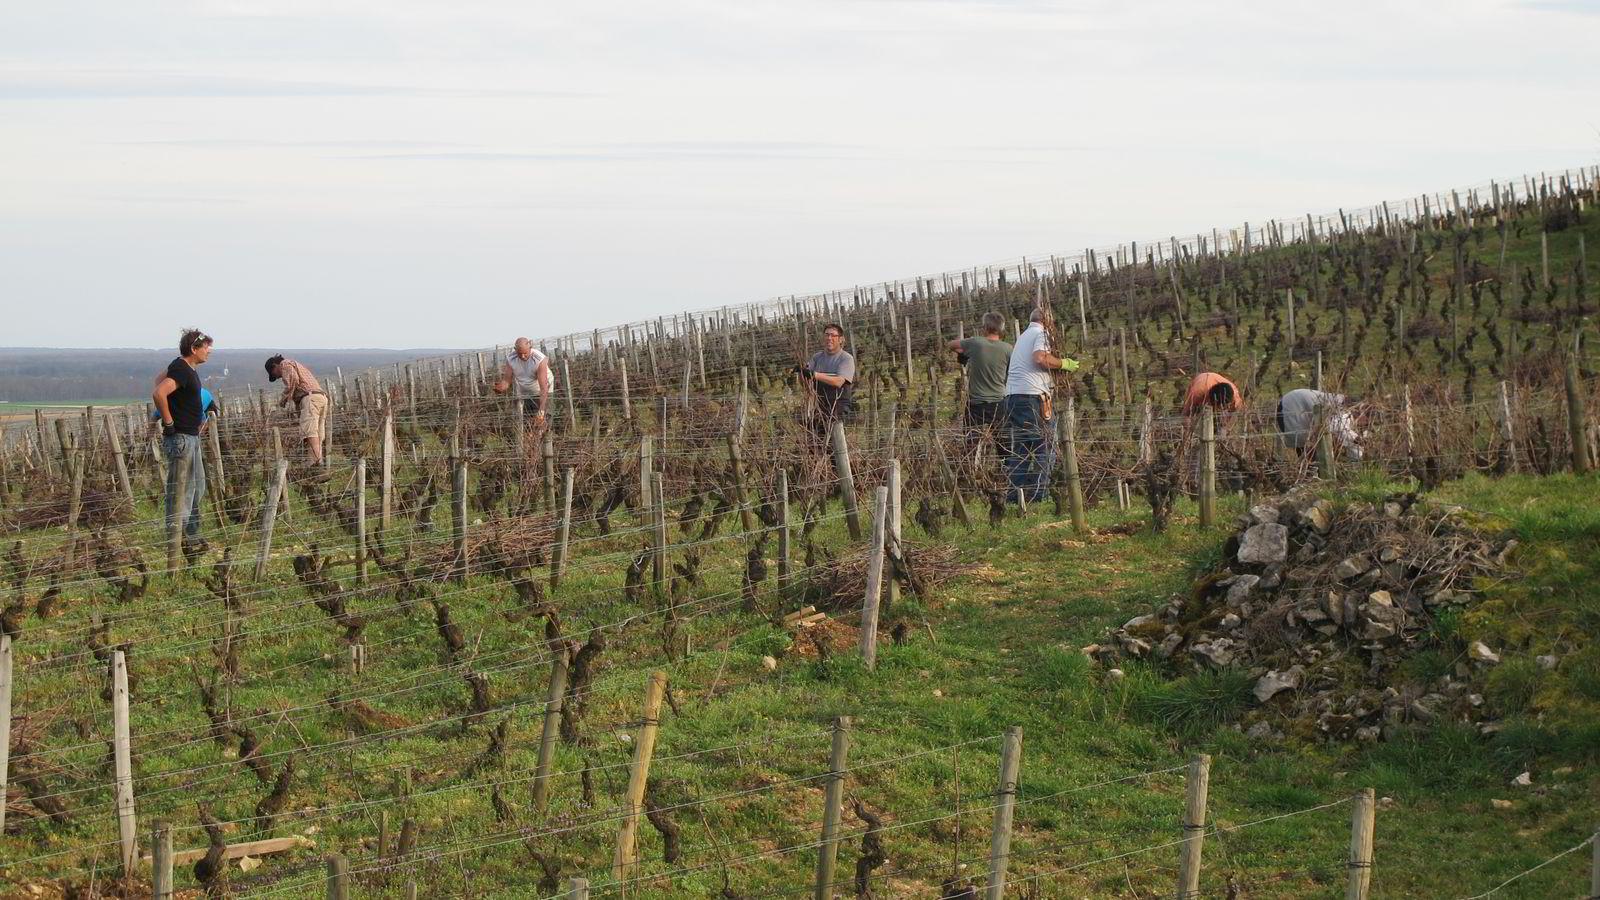 Vinmarksarbeidere i Vosne-Romanée